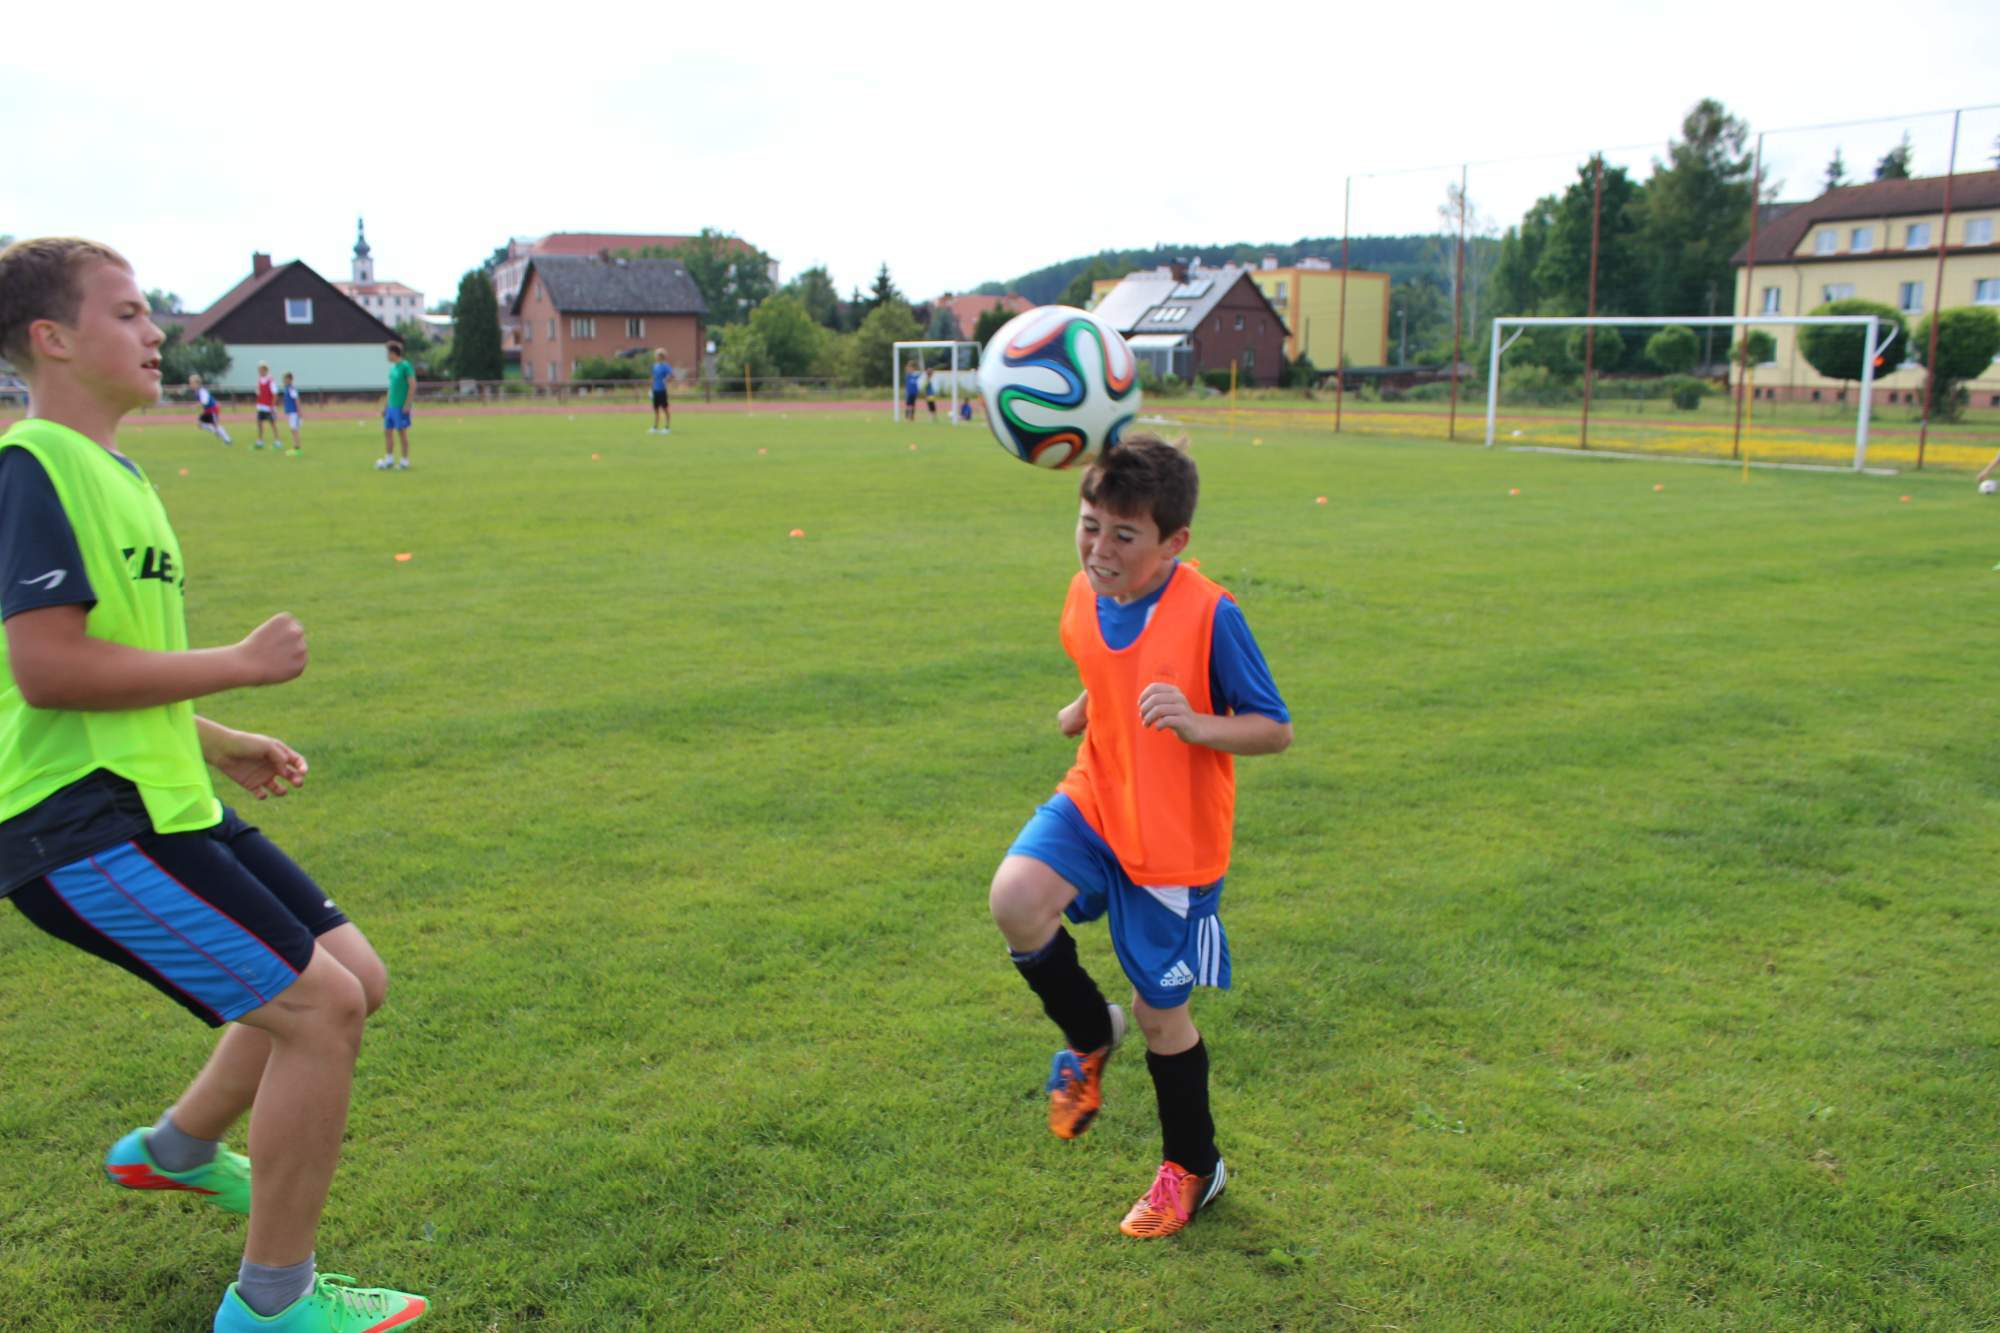 Fotbalové prázdniny Fotbalový kemp Fotbalové Prázdniny 2014 Jdem do toho naplno!